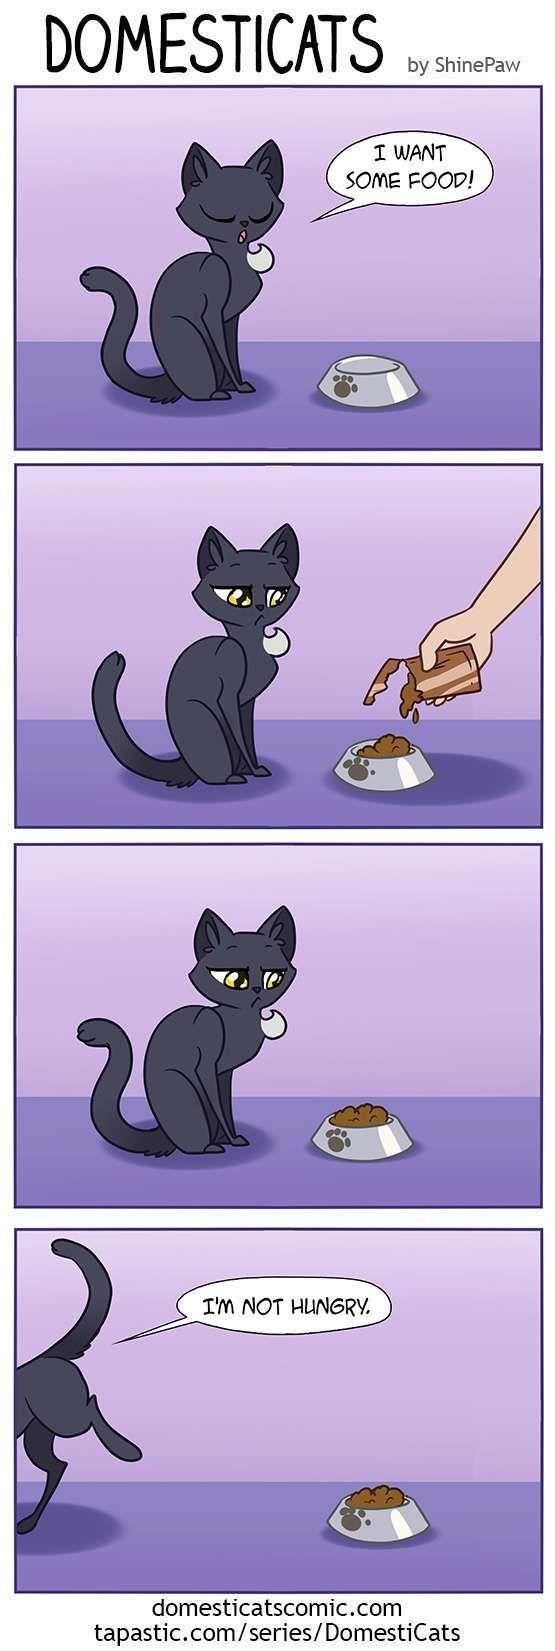 DomestiCats :: Some food | Tapastic Comics - image 1